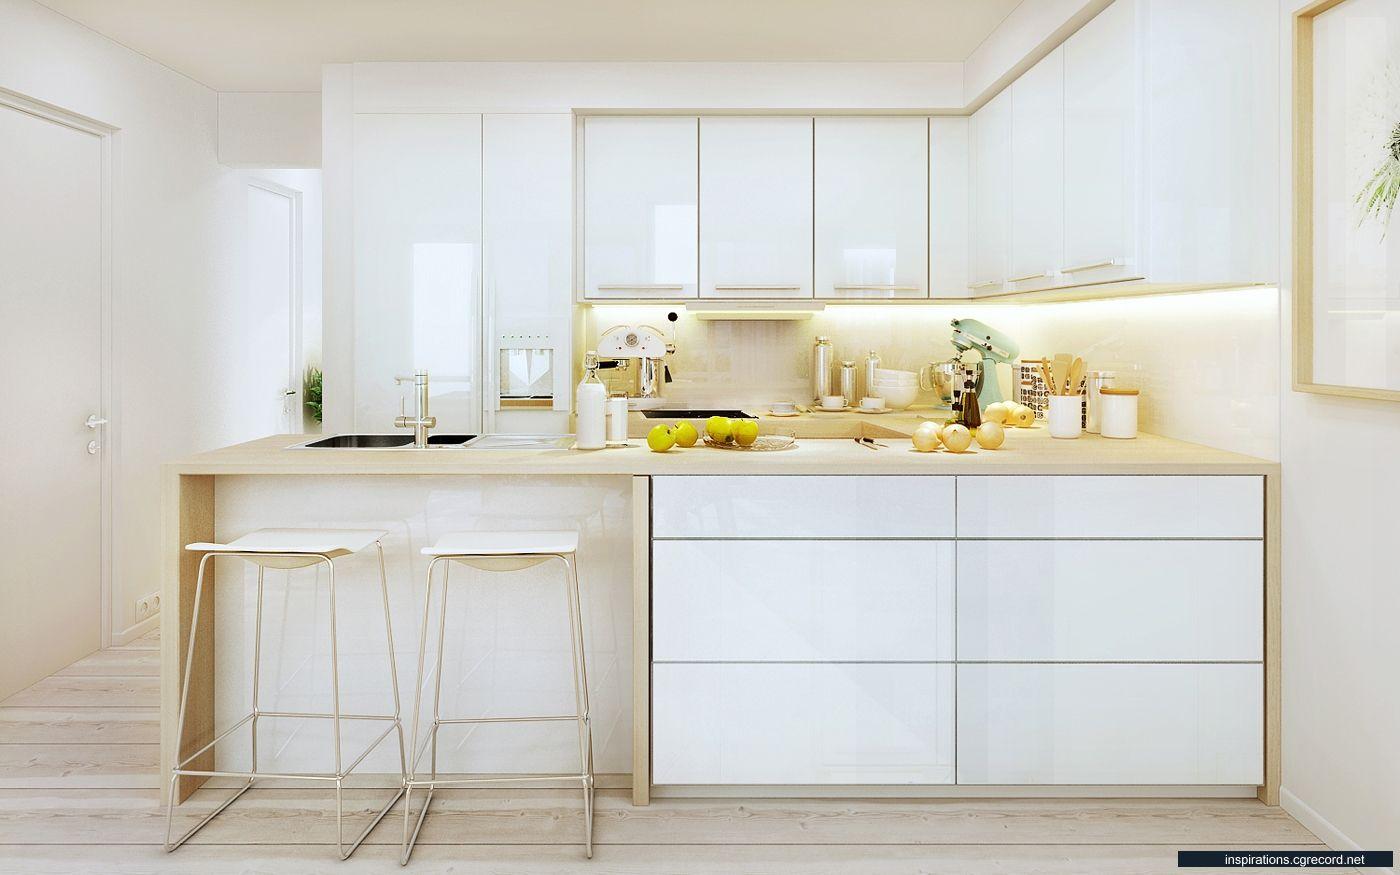 Interior: Apartment Renderings | Inspirations Area | Inspiring 3D ...